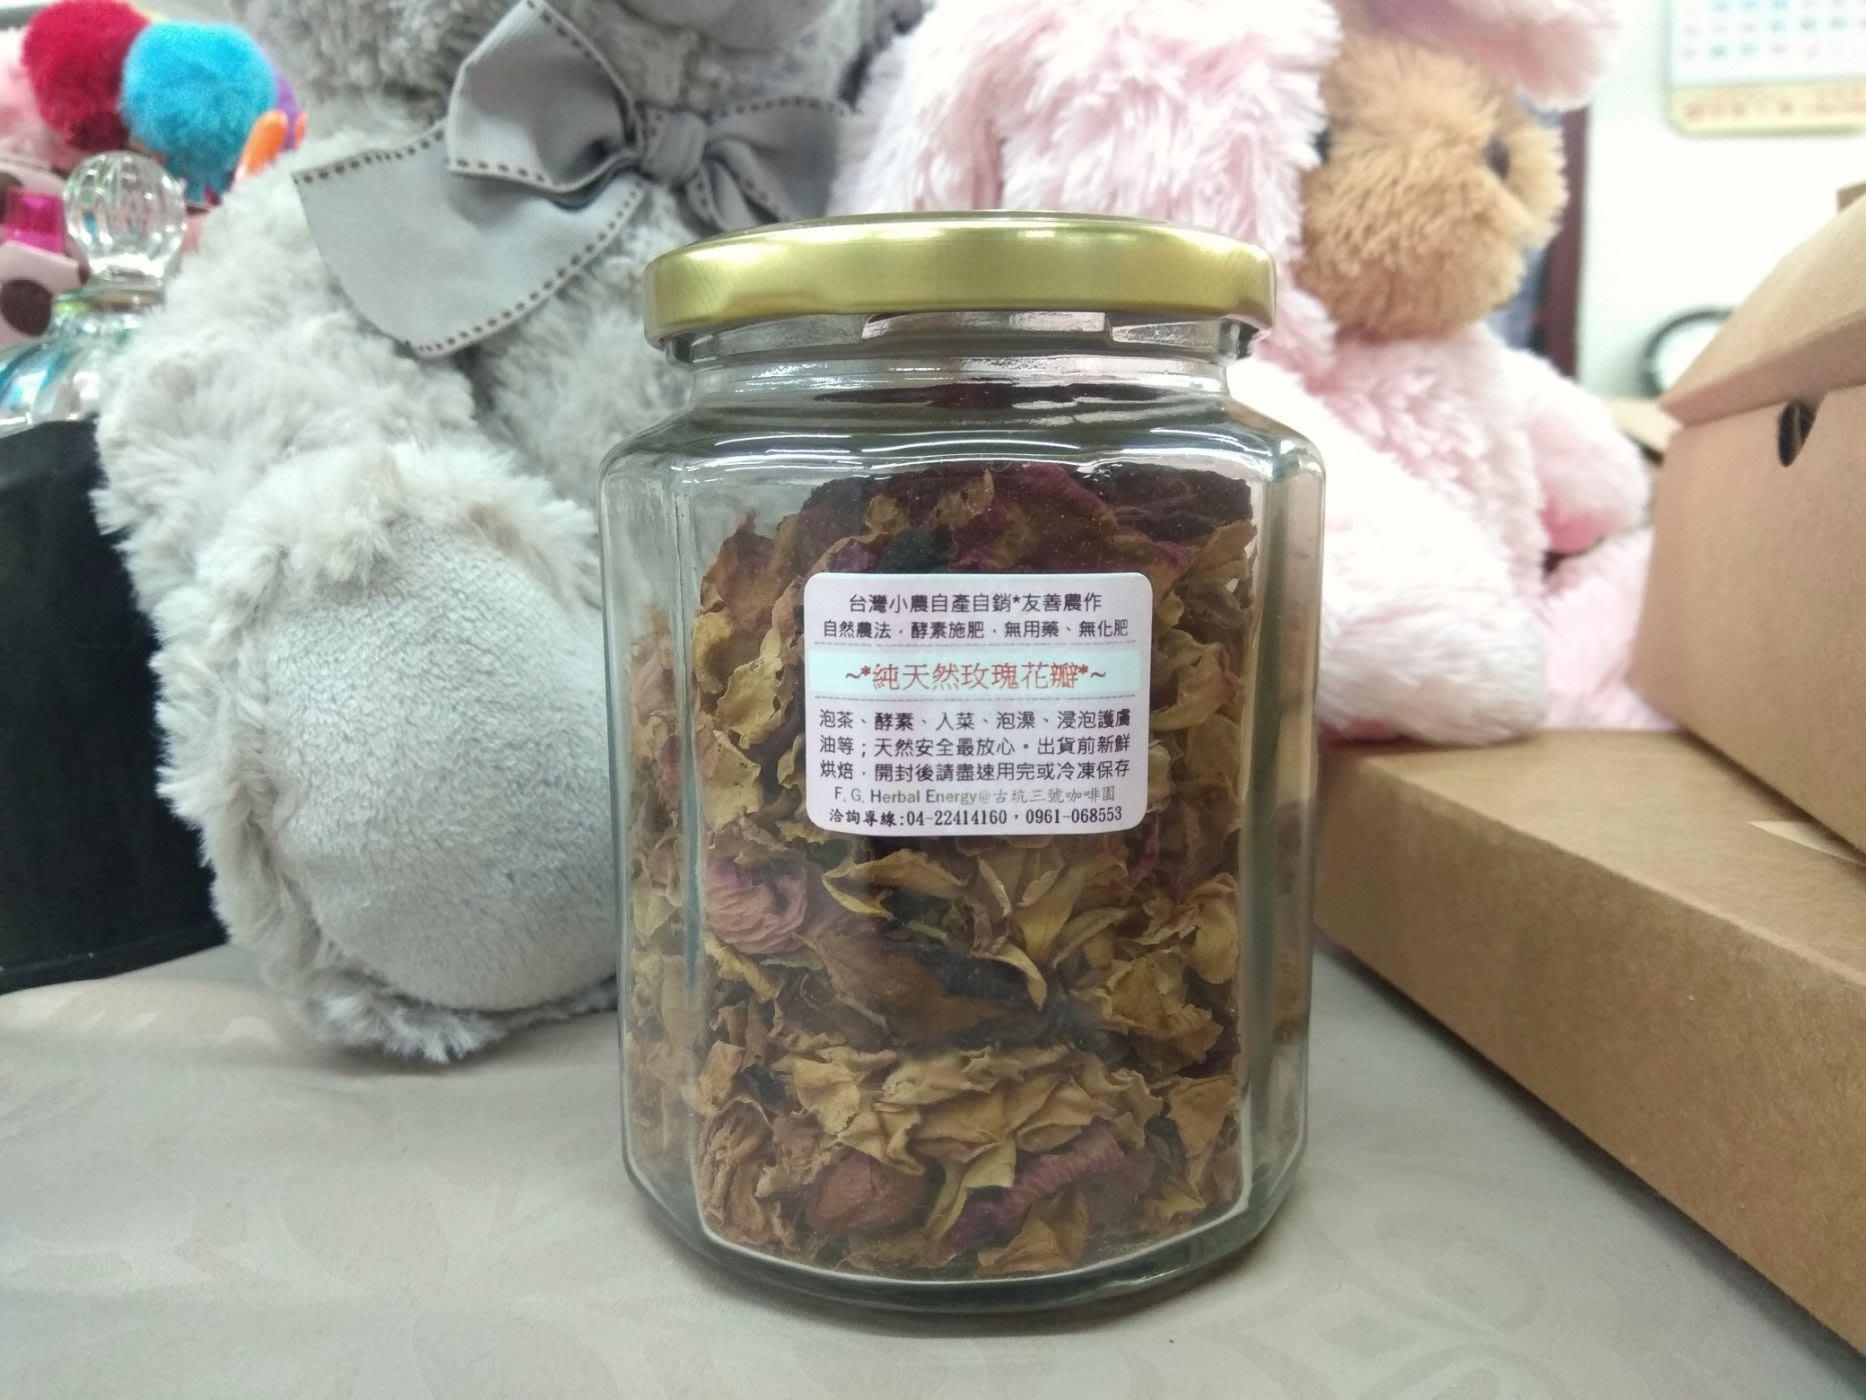 H.E.古坑3號玫瑰花瓣(乾燥)~可直接使食用,自然農法,酵素施肥,無毒無藥最安心~每罐玻璃包裝15g新品試賣350元